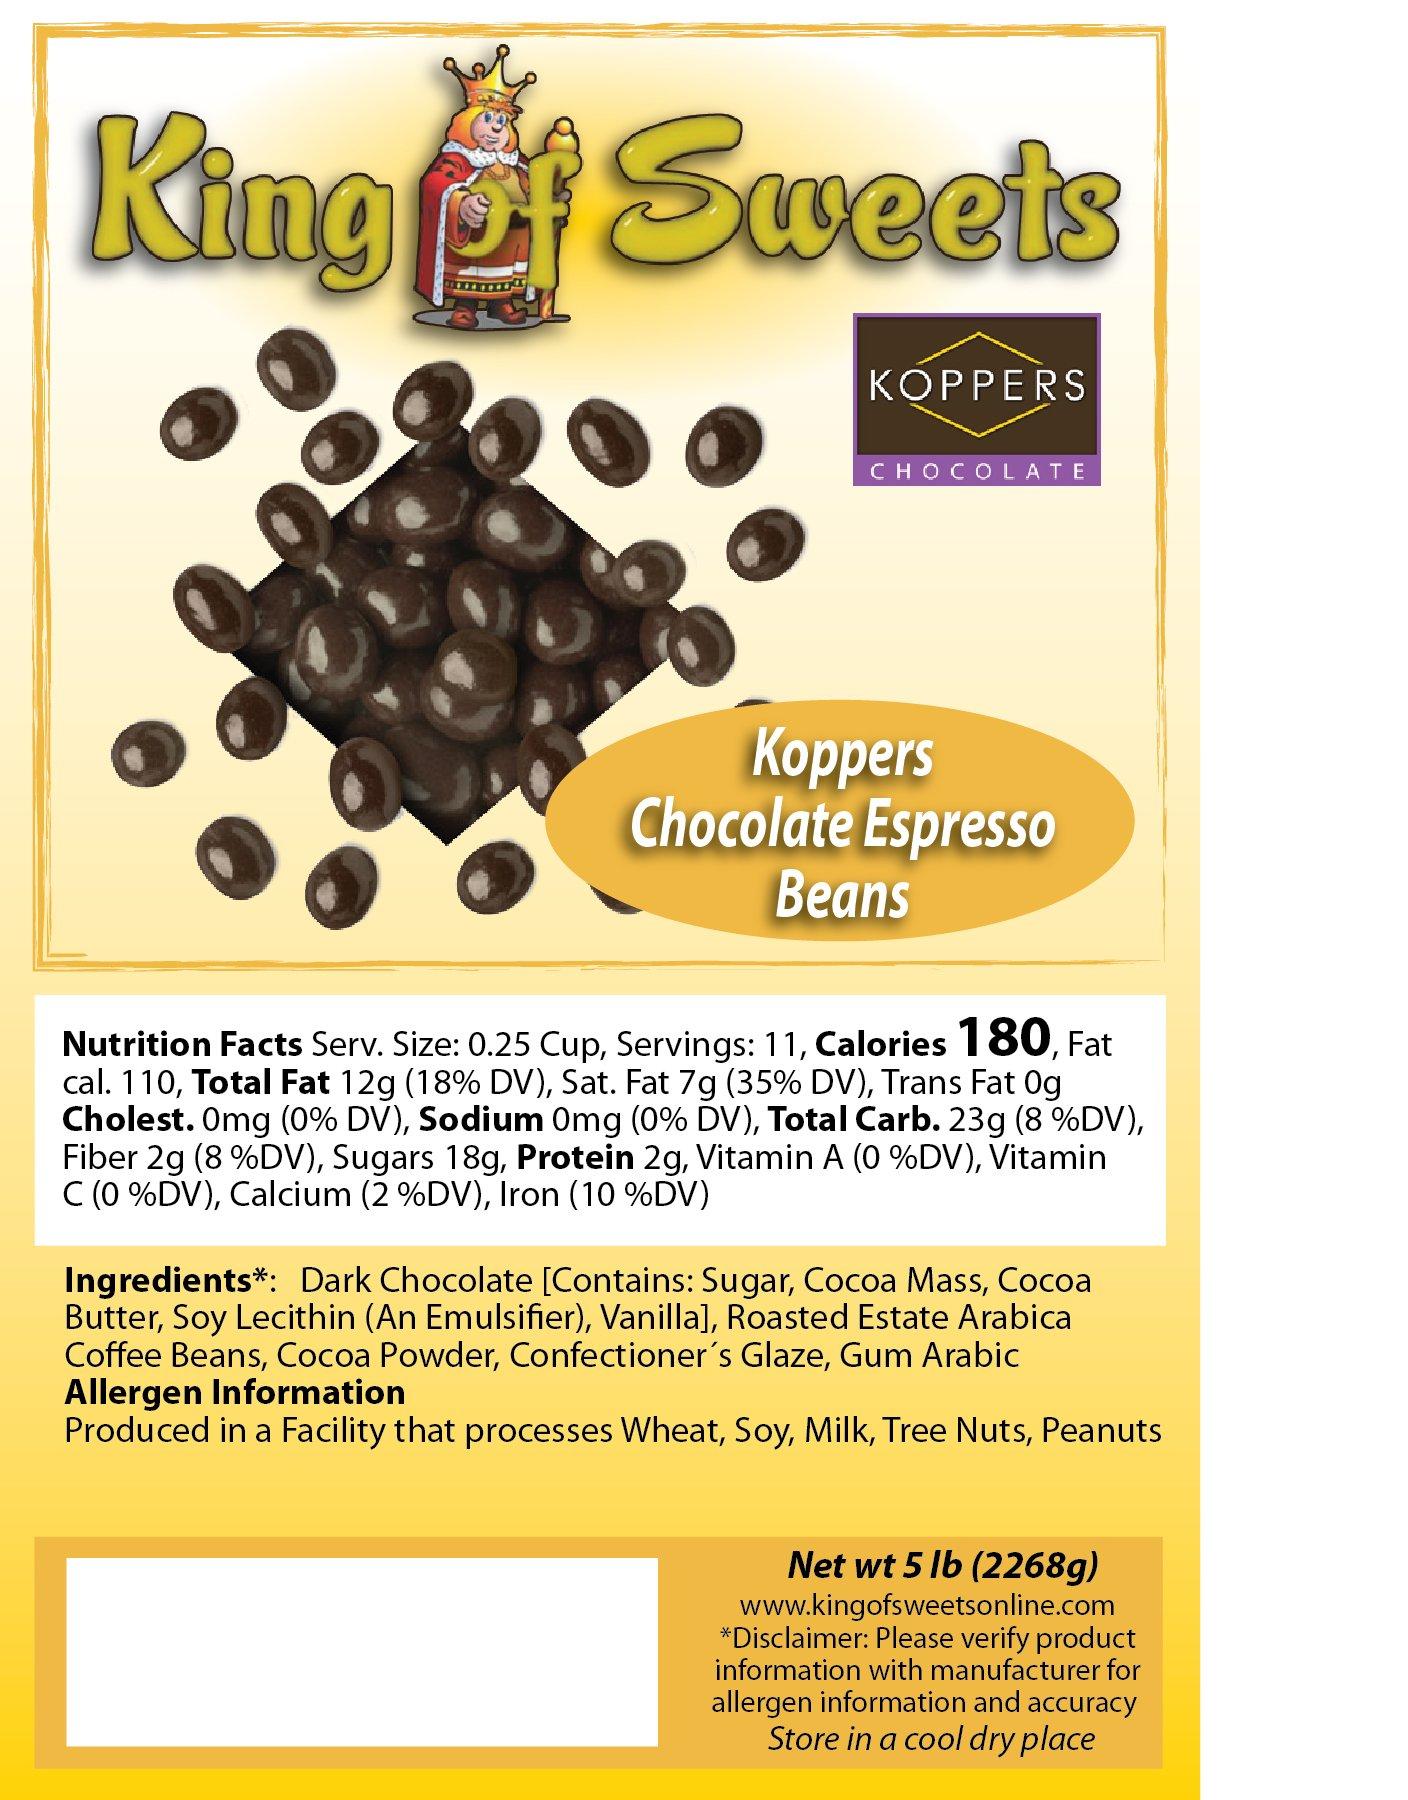 Koppers Chocolate Espresso Beans (10 LB)